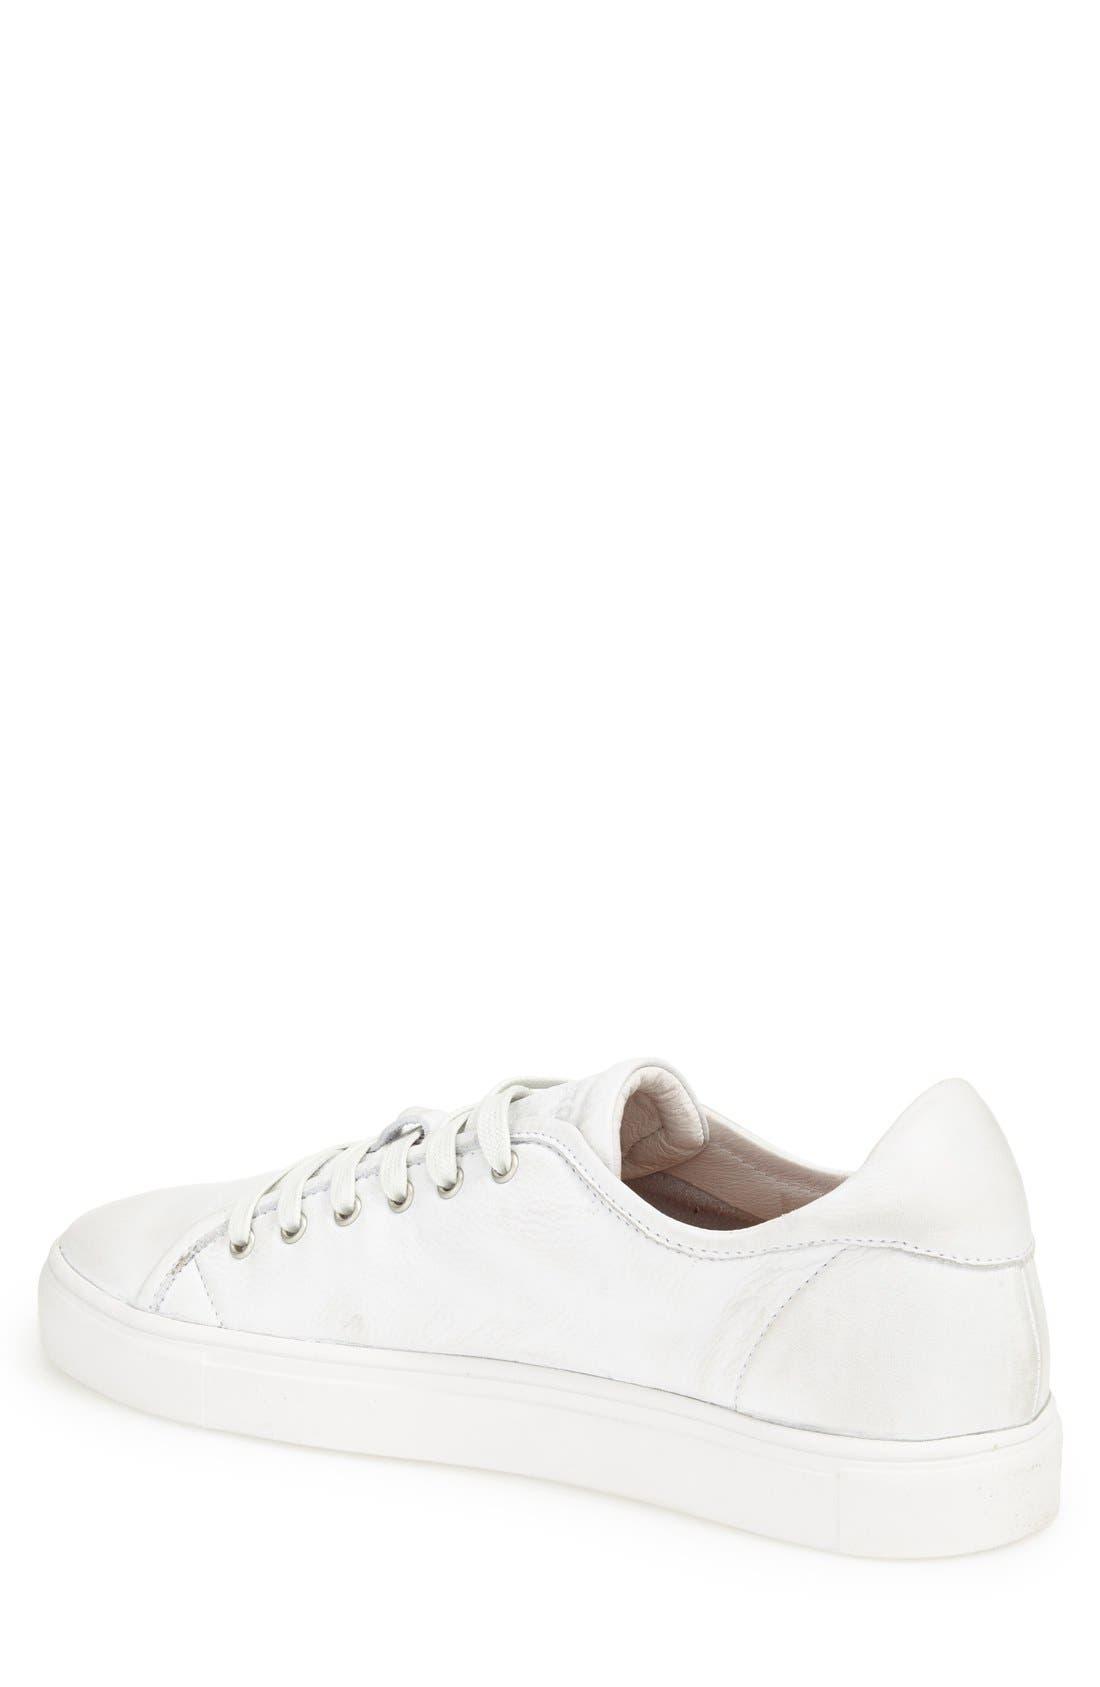 Blacktone 'LM24' Sneaker,                             Alternate thumbnail 2, color,                             White